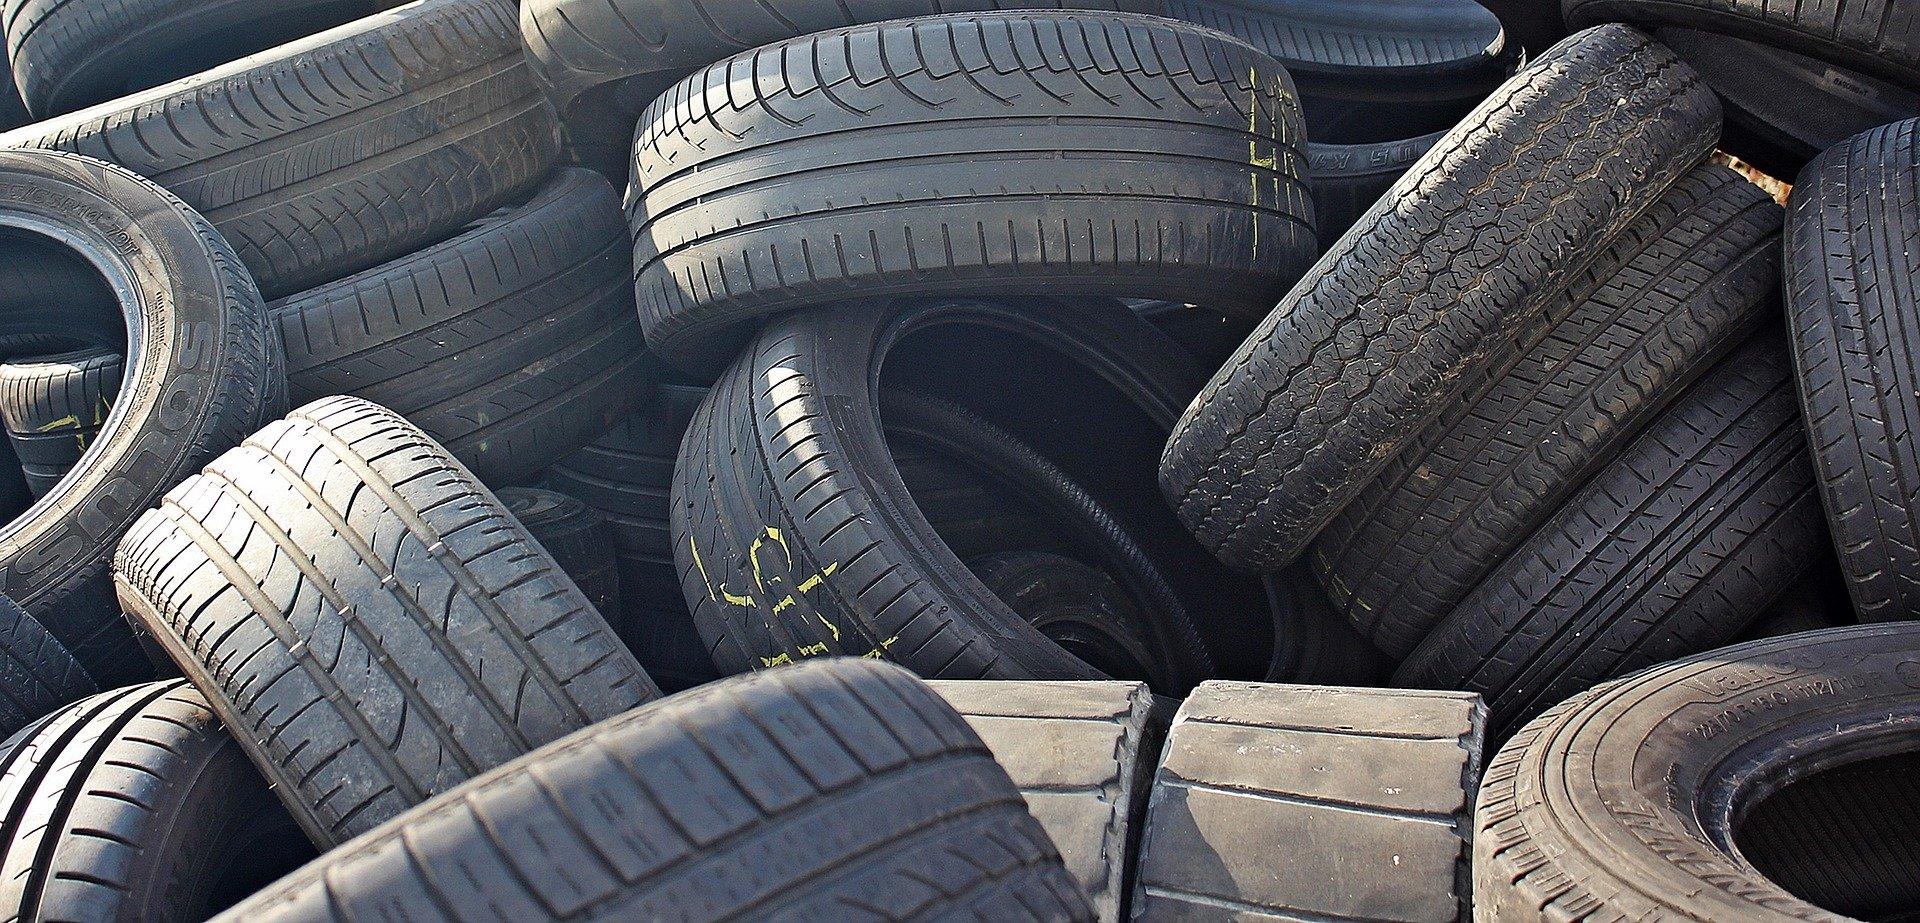 Settore ecologia: smaltimento pneumatici